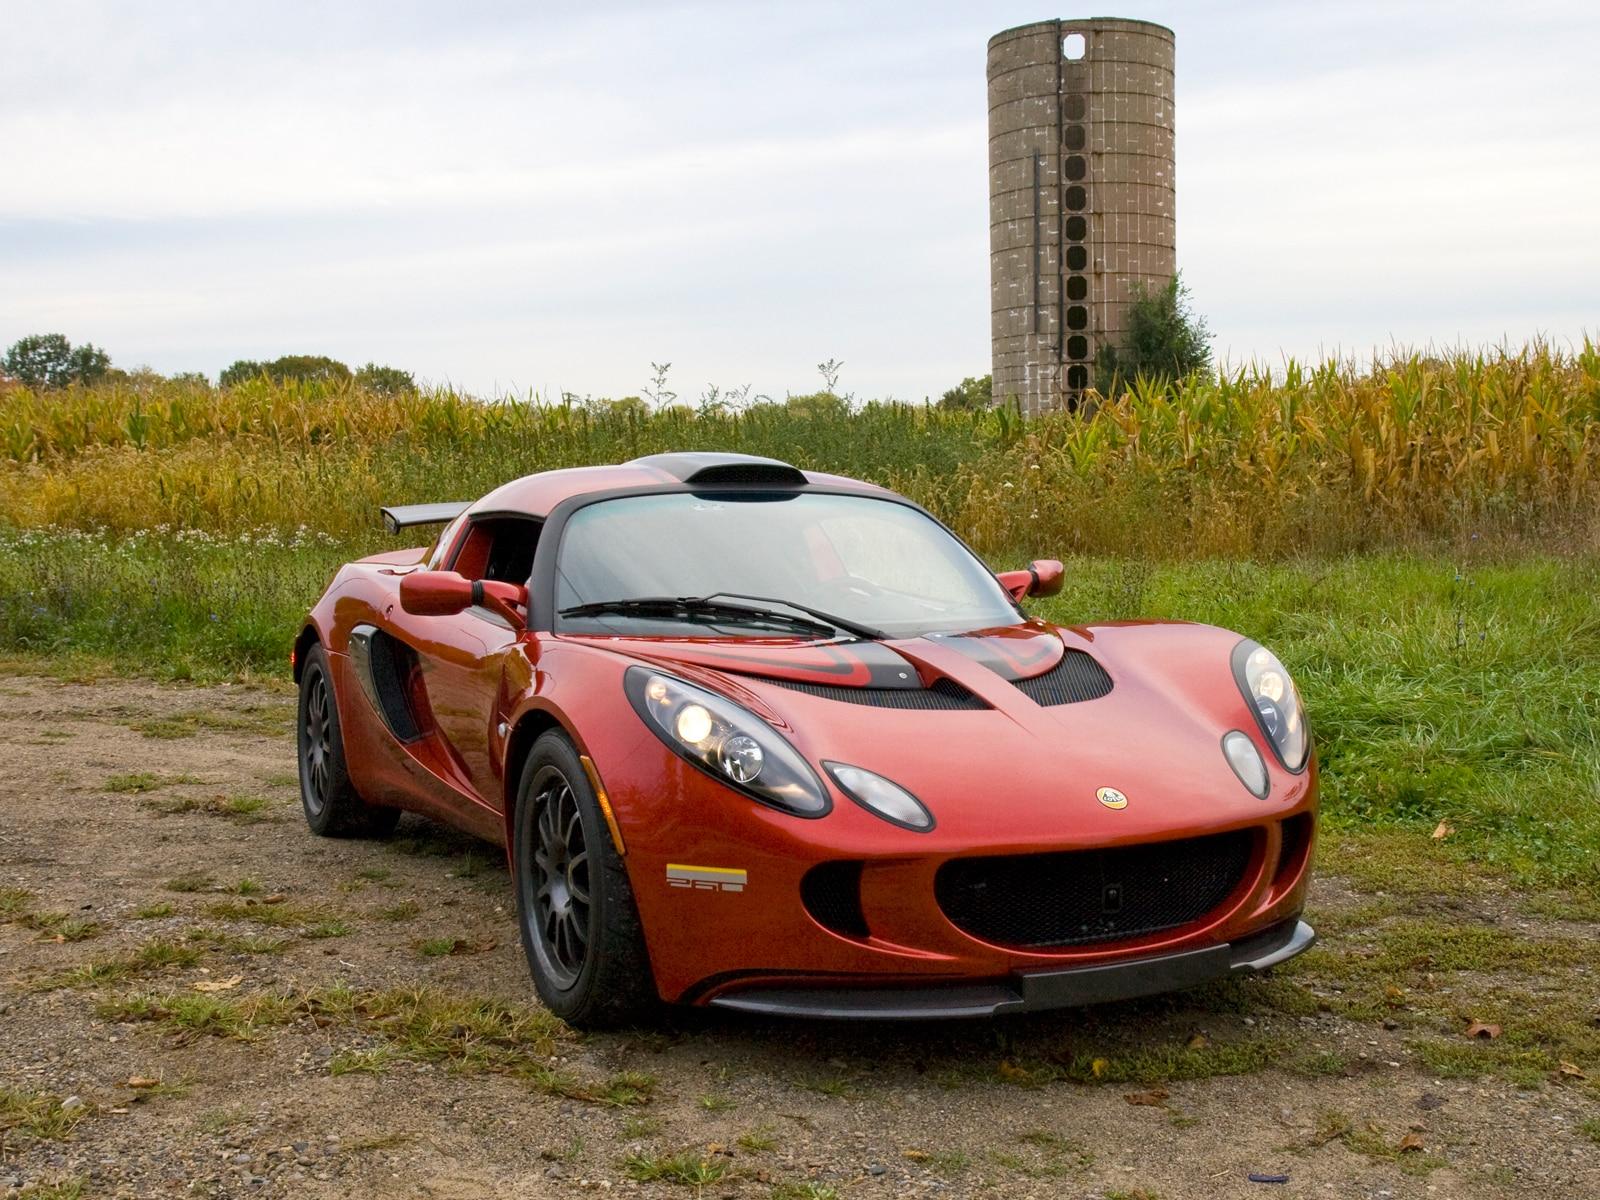 http://st.automobilemag.com/uploads/sites/11/2009/10/0910-02-z-2010-lotus-exige-260-s-front-three-quarters-view.jpg